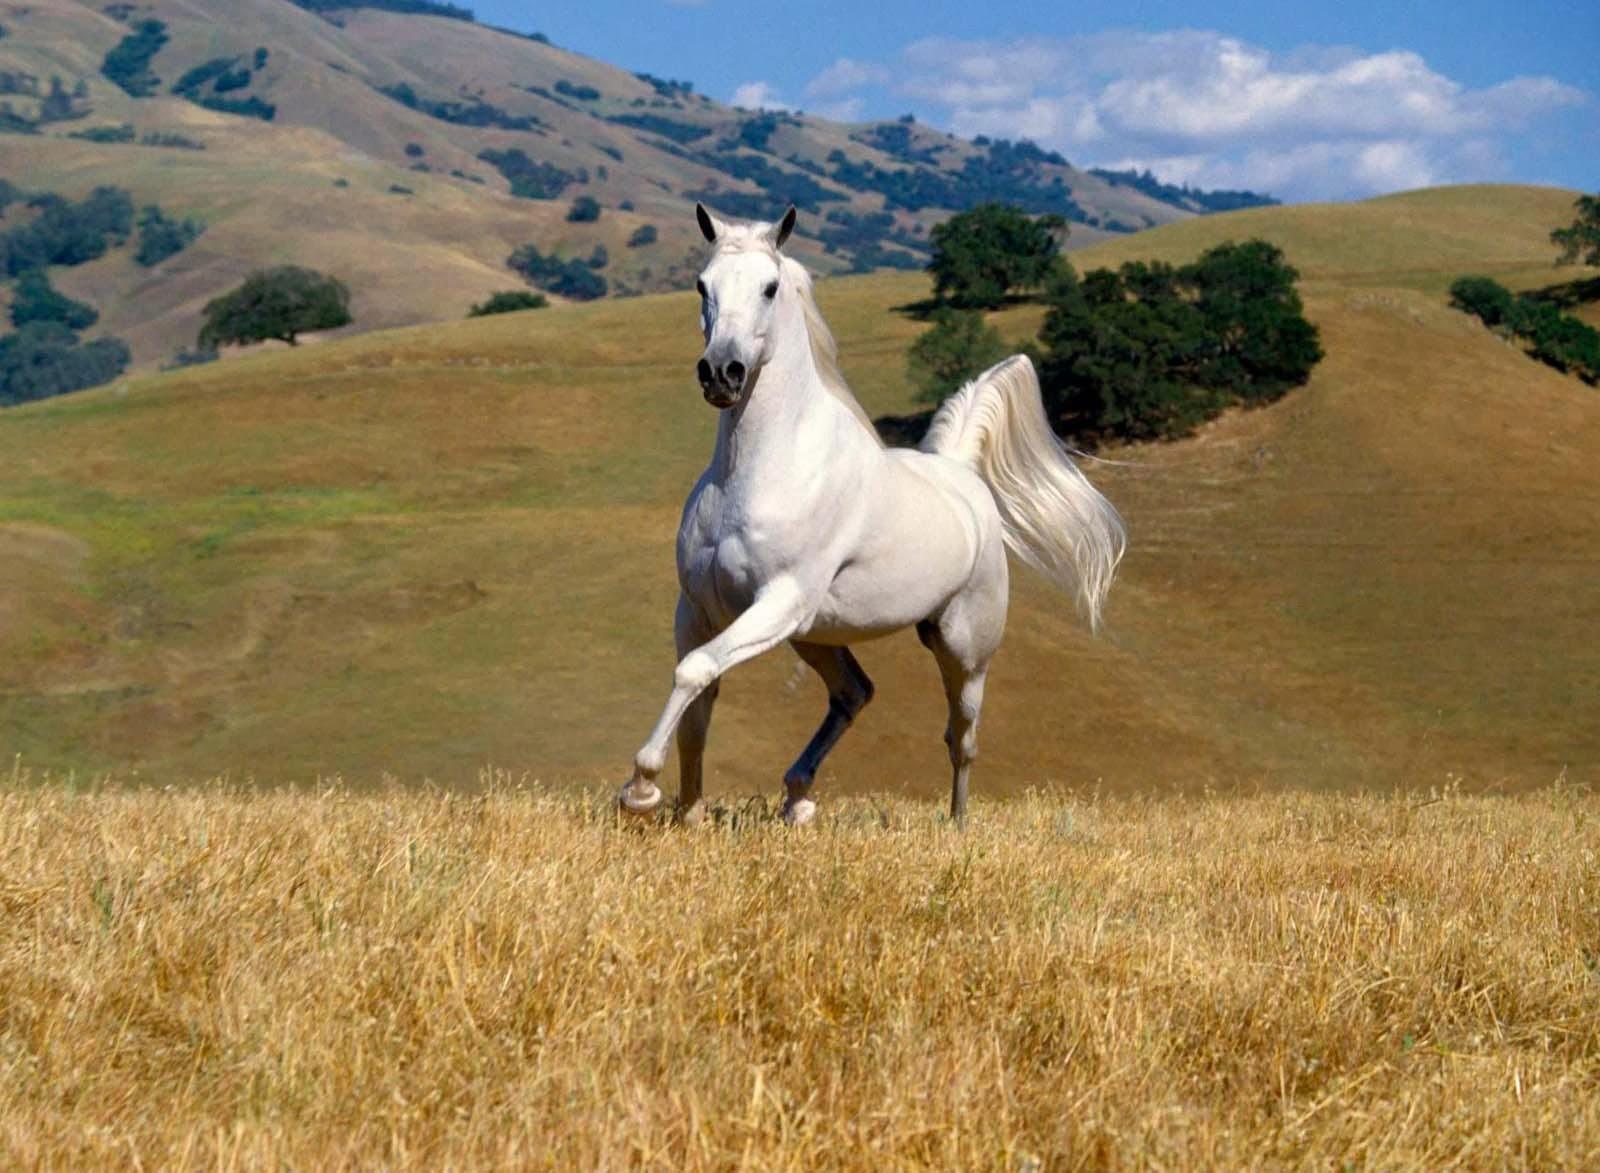 Wonderful   Wallpaper Horse Laptop - Horse+Wallpapers+HD+Desktop+Wallpapers  2018_882955.jpg